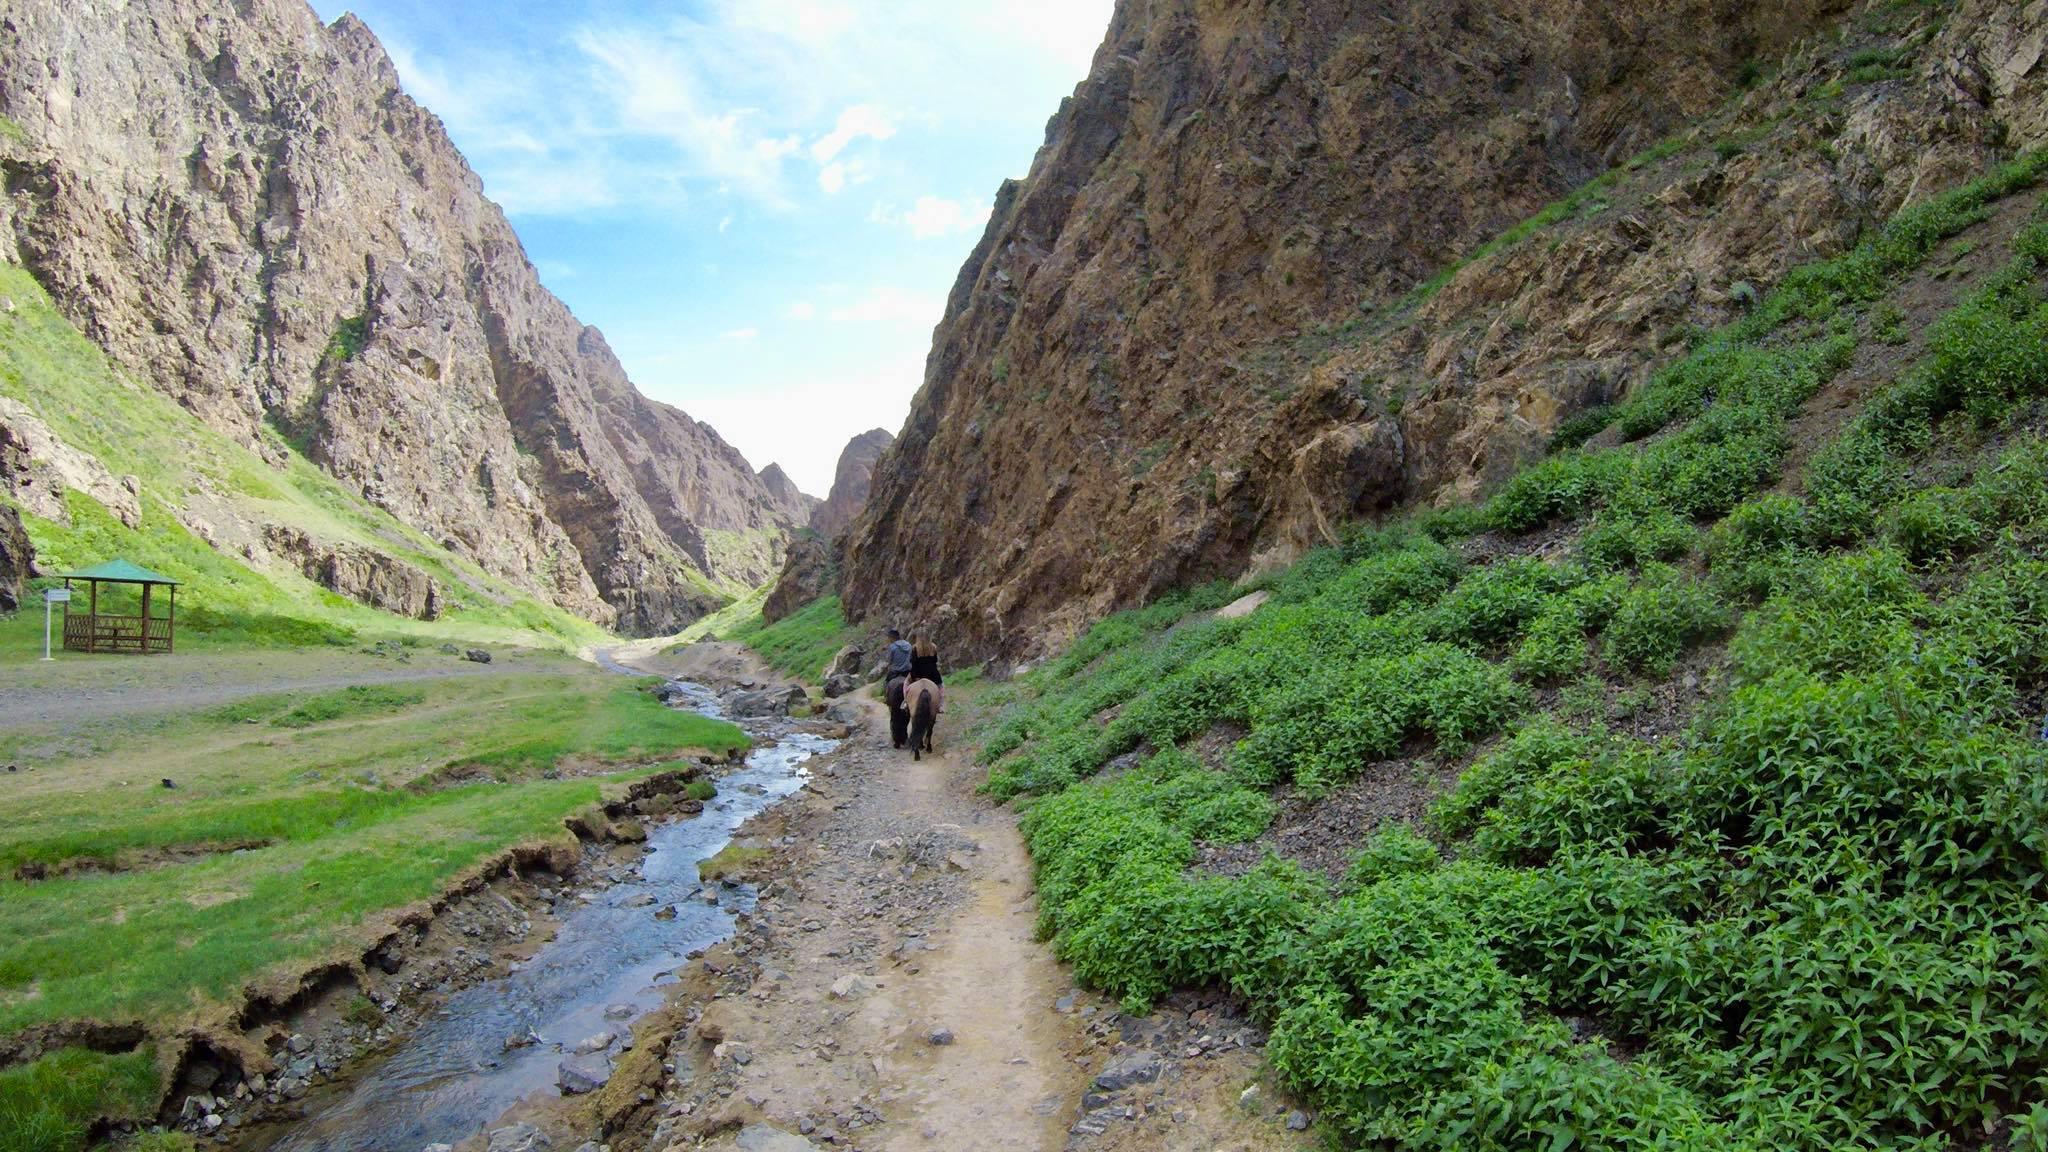 Kach Solo Travels in 2019 Horseback riding trip to the Gobi Gurvan Saikhan National Park20.jpg